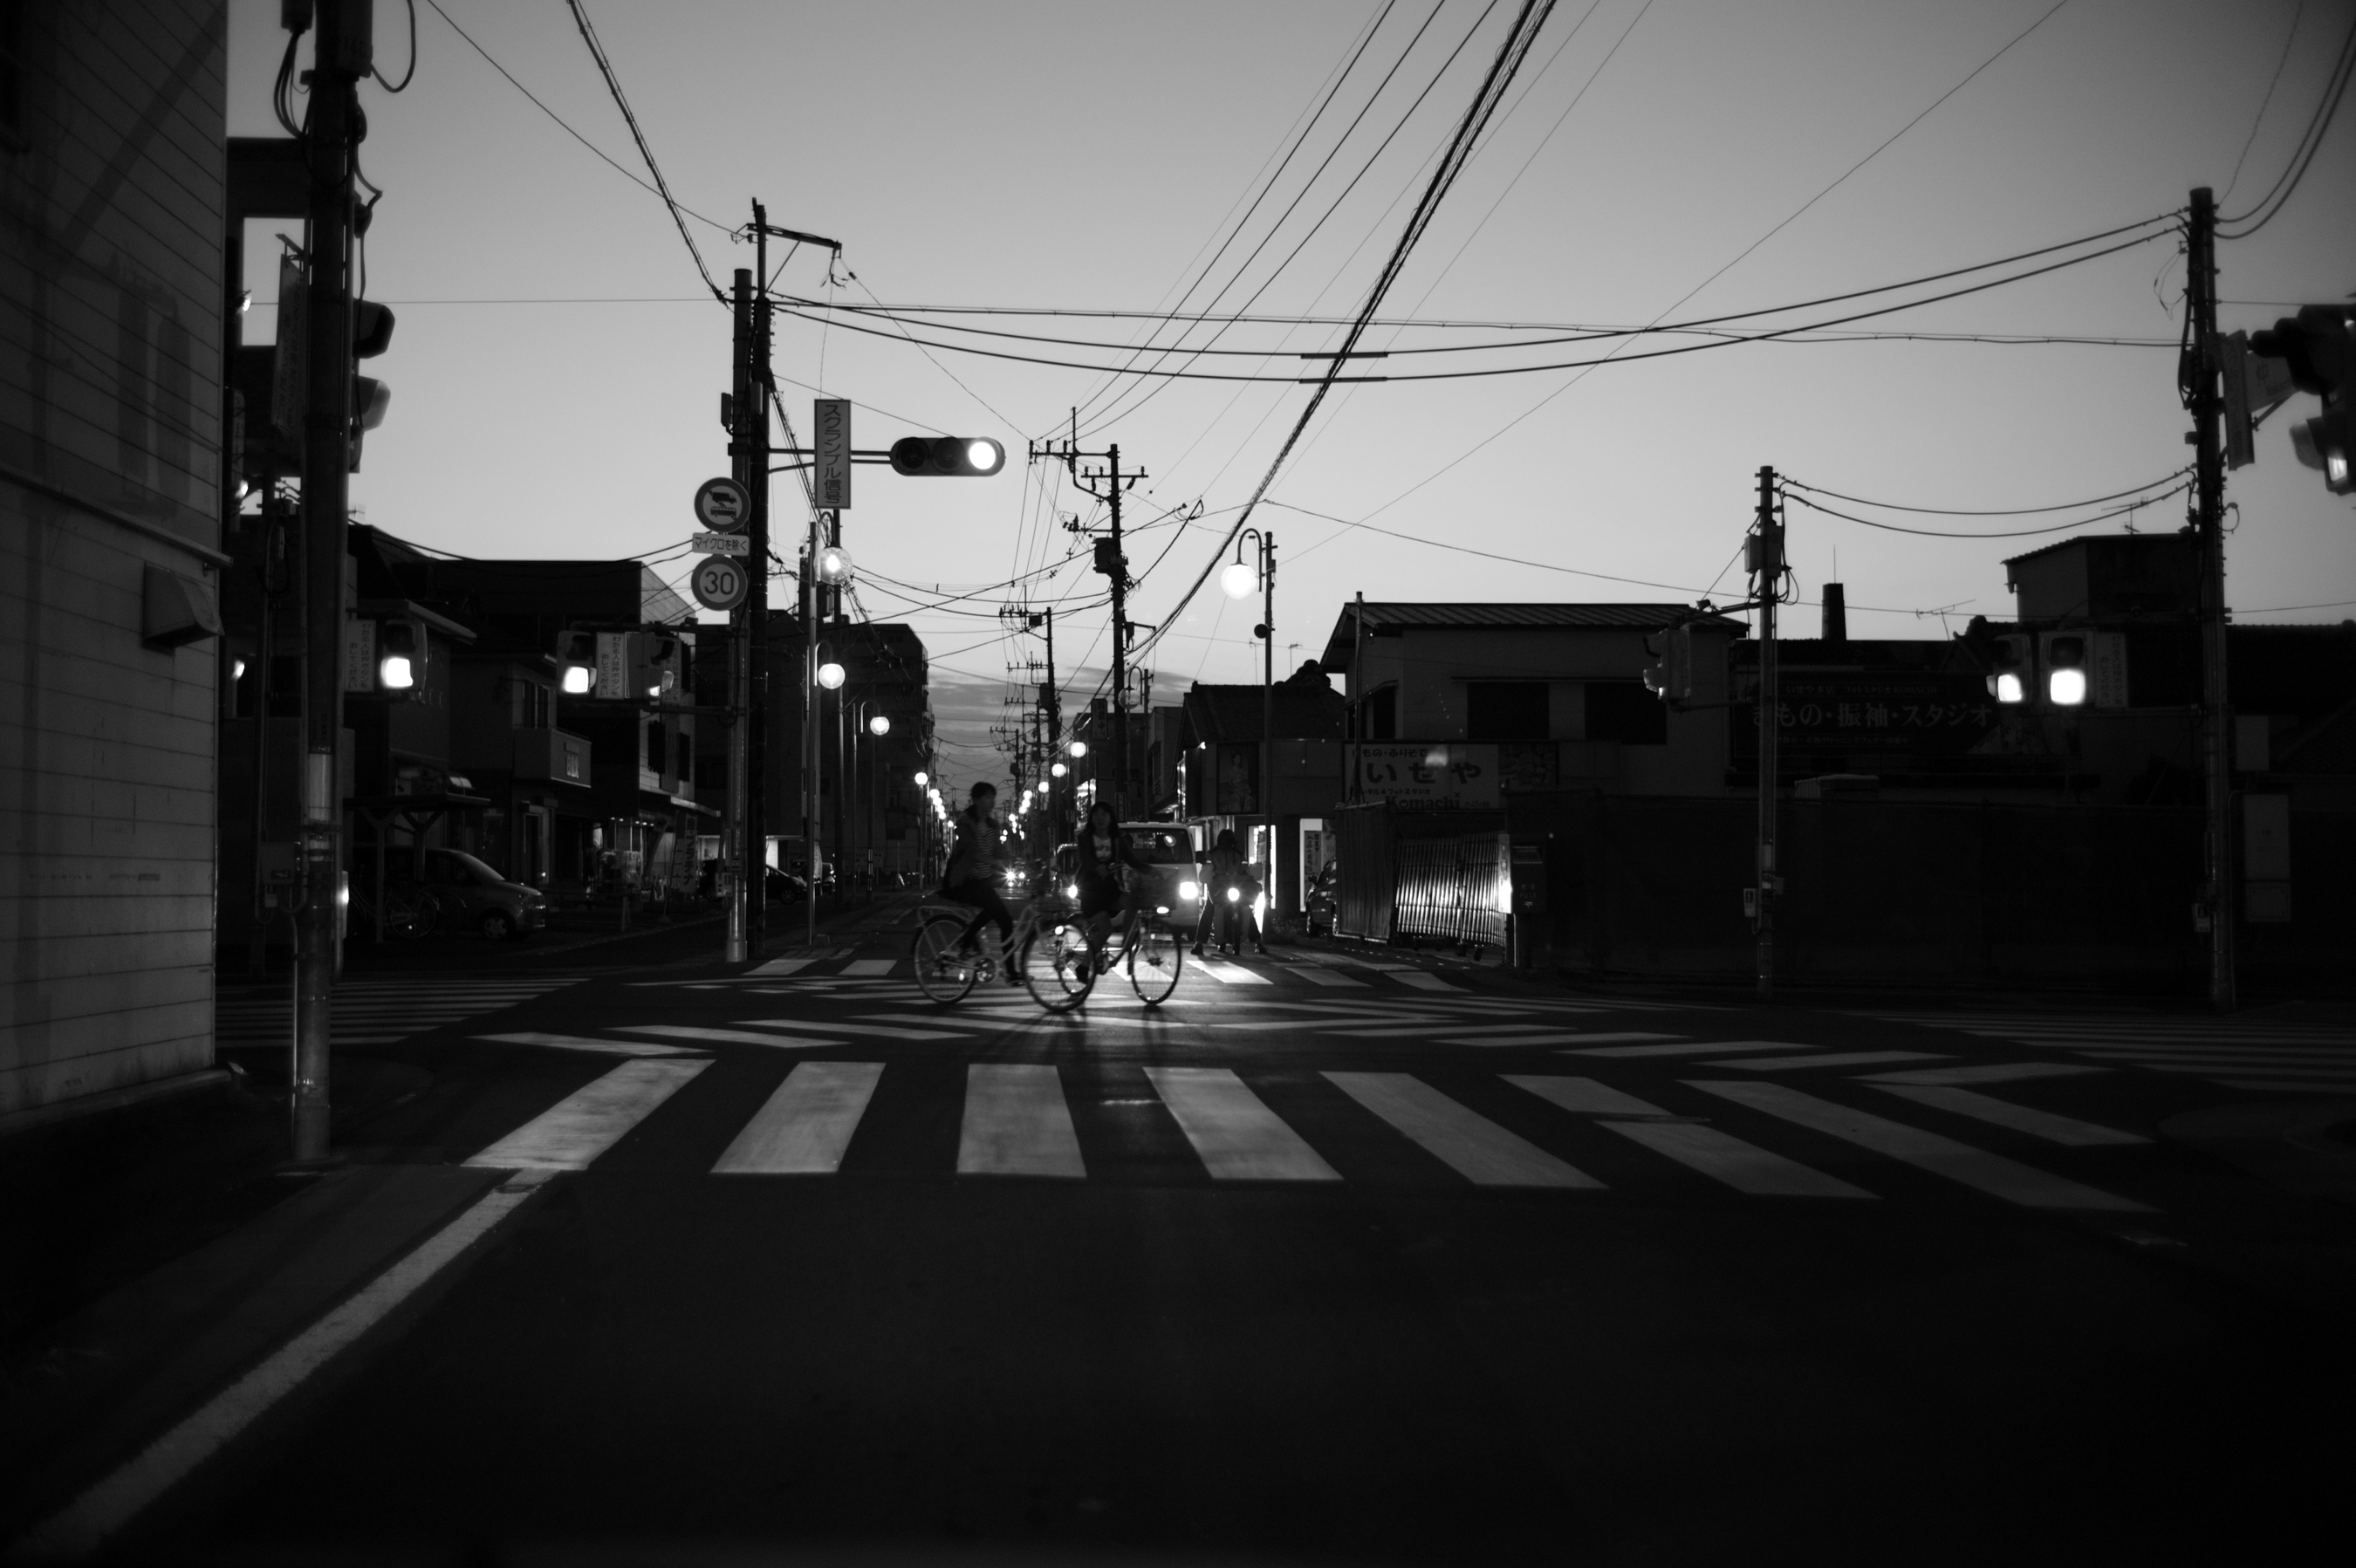 f:id:aoyama-takuro:20180908090714j:plain